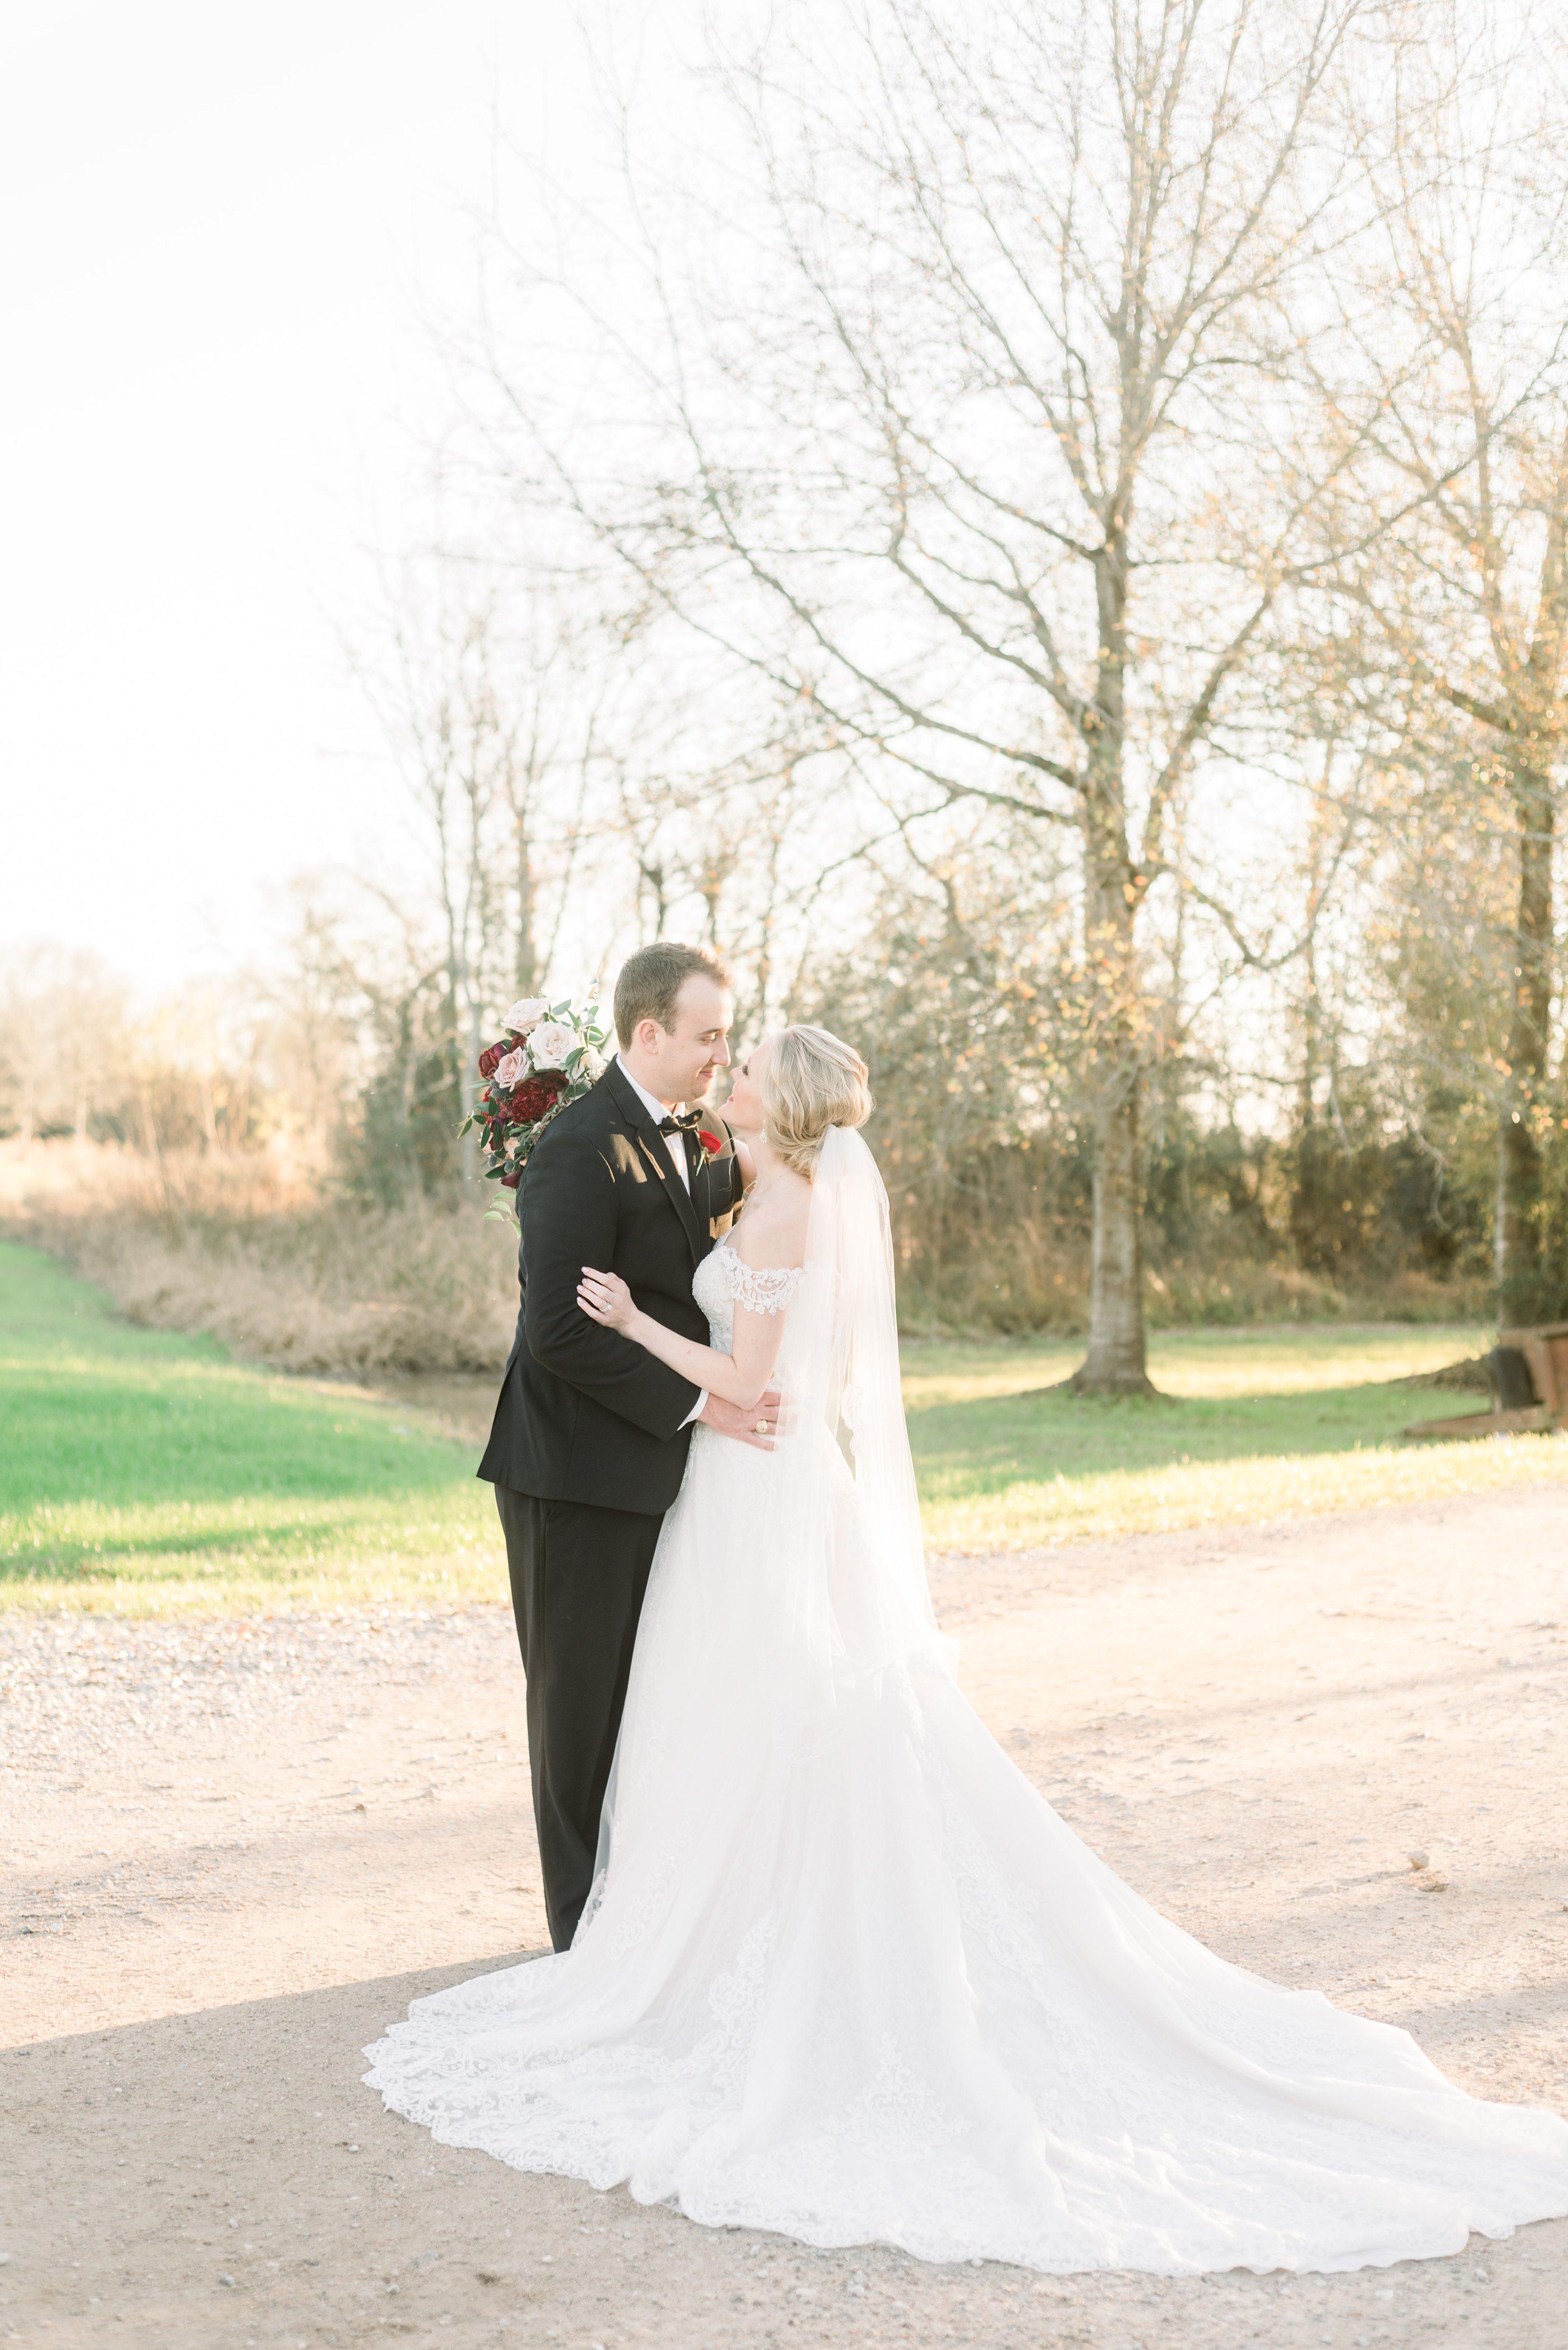 Eric & Jenn Photography,Husband & Wife Team